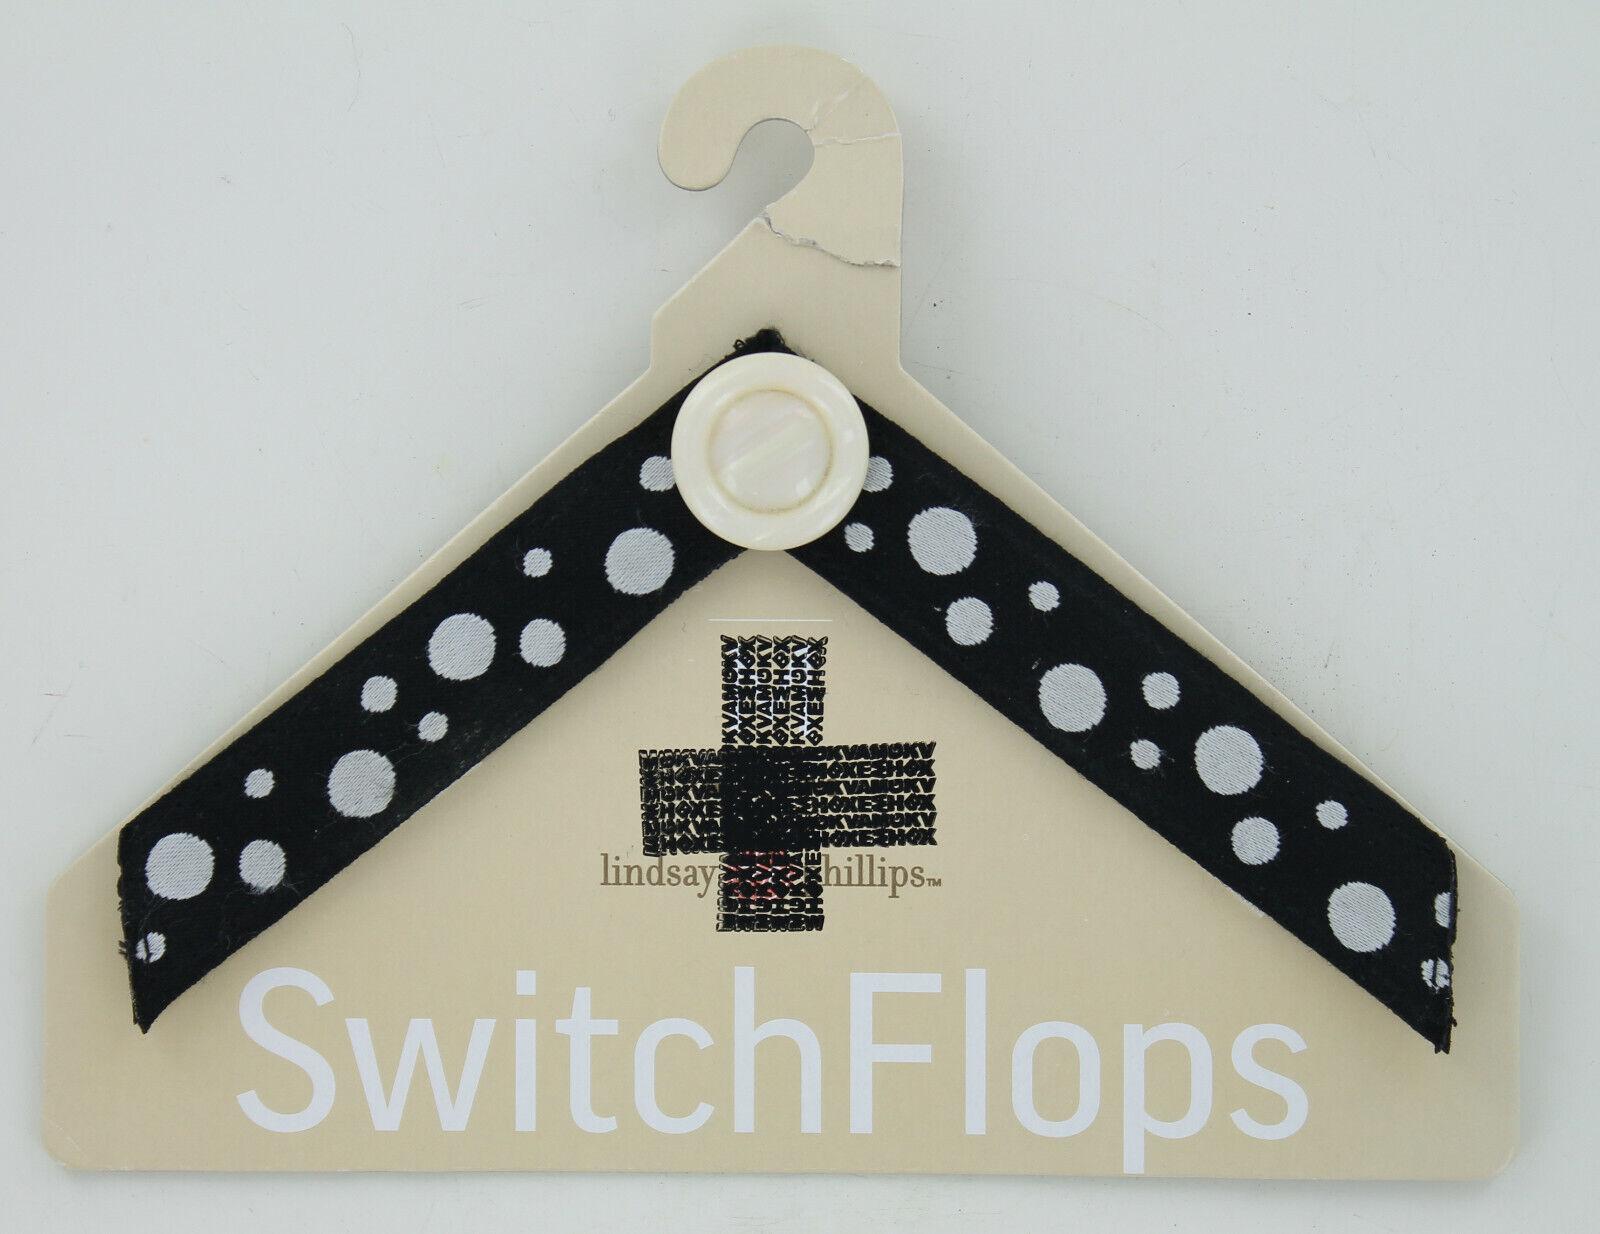 Lindsay Phillips SwitchFlops Straps - Black w/ White Polka Dots - Size Small